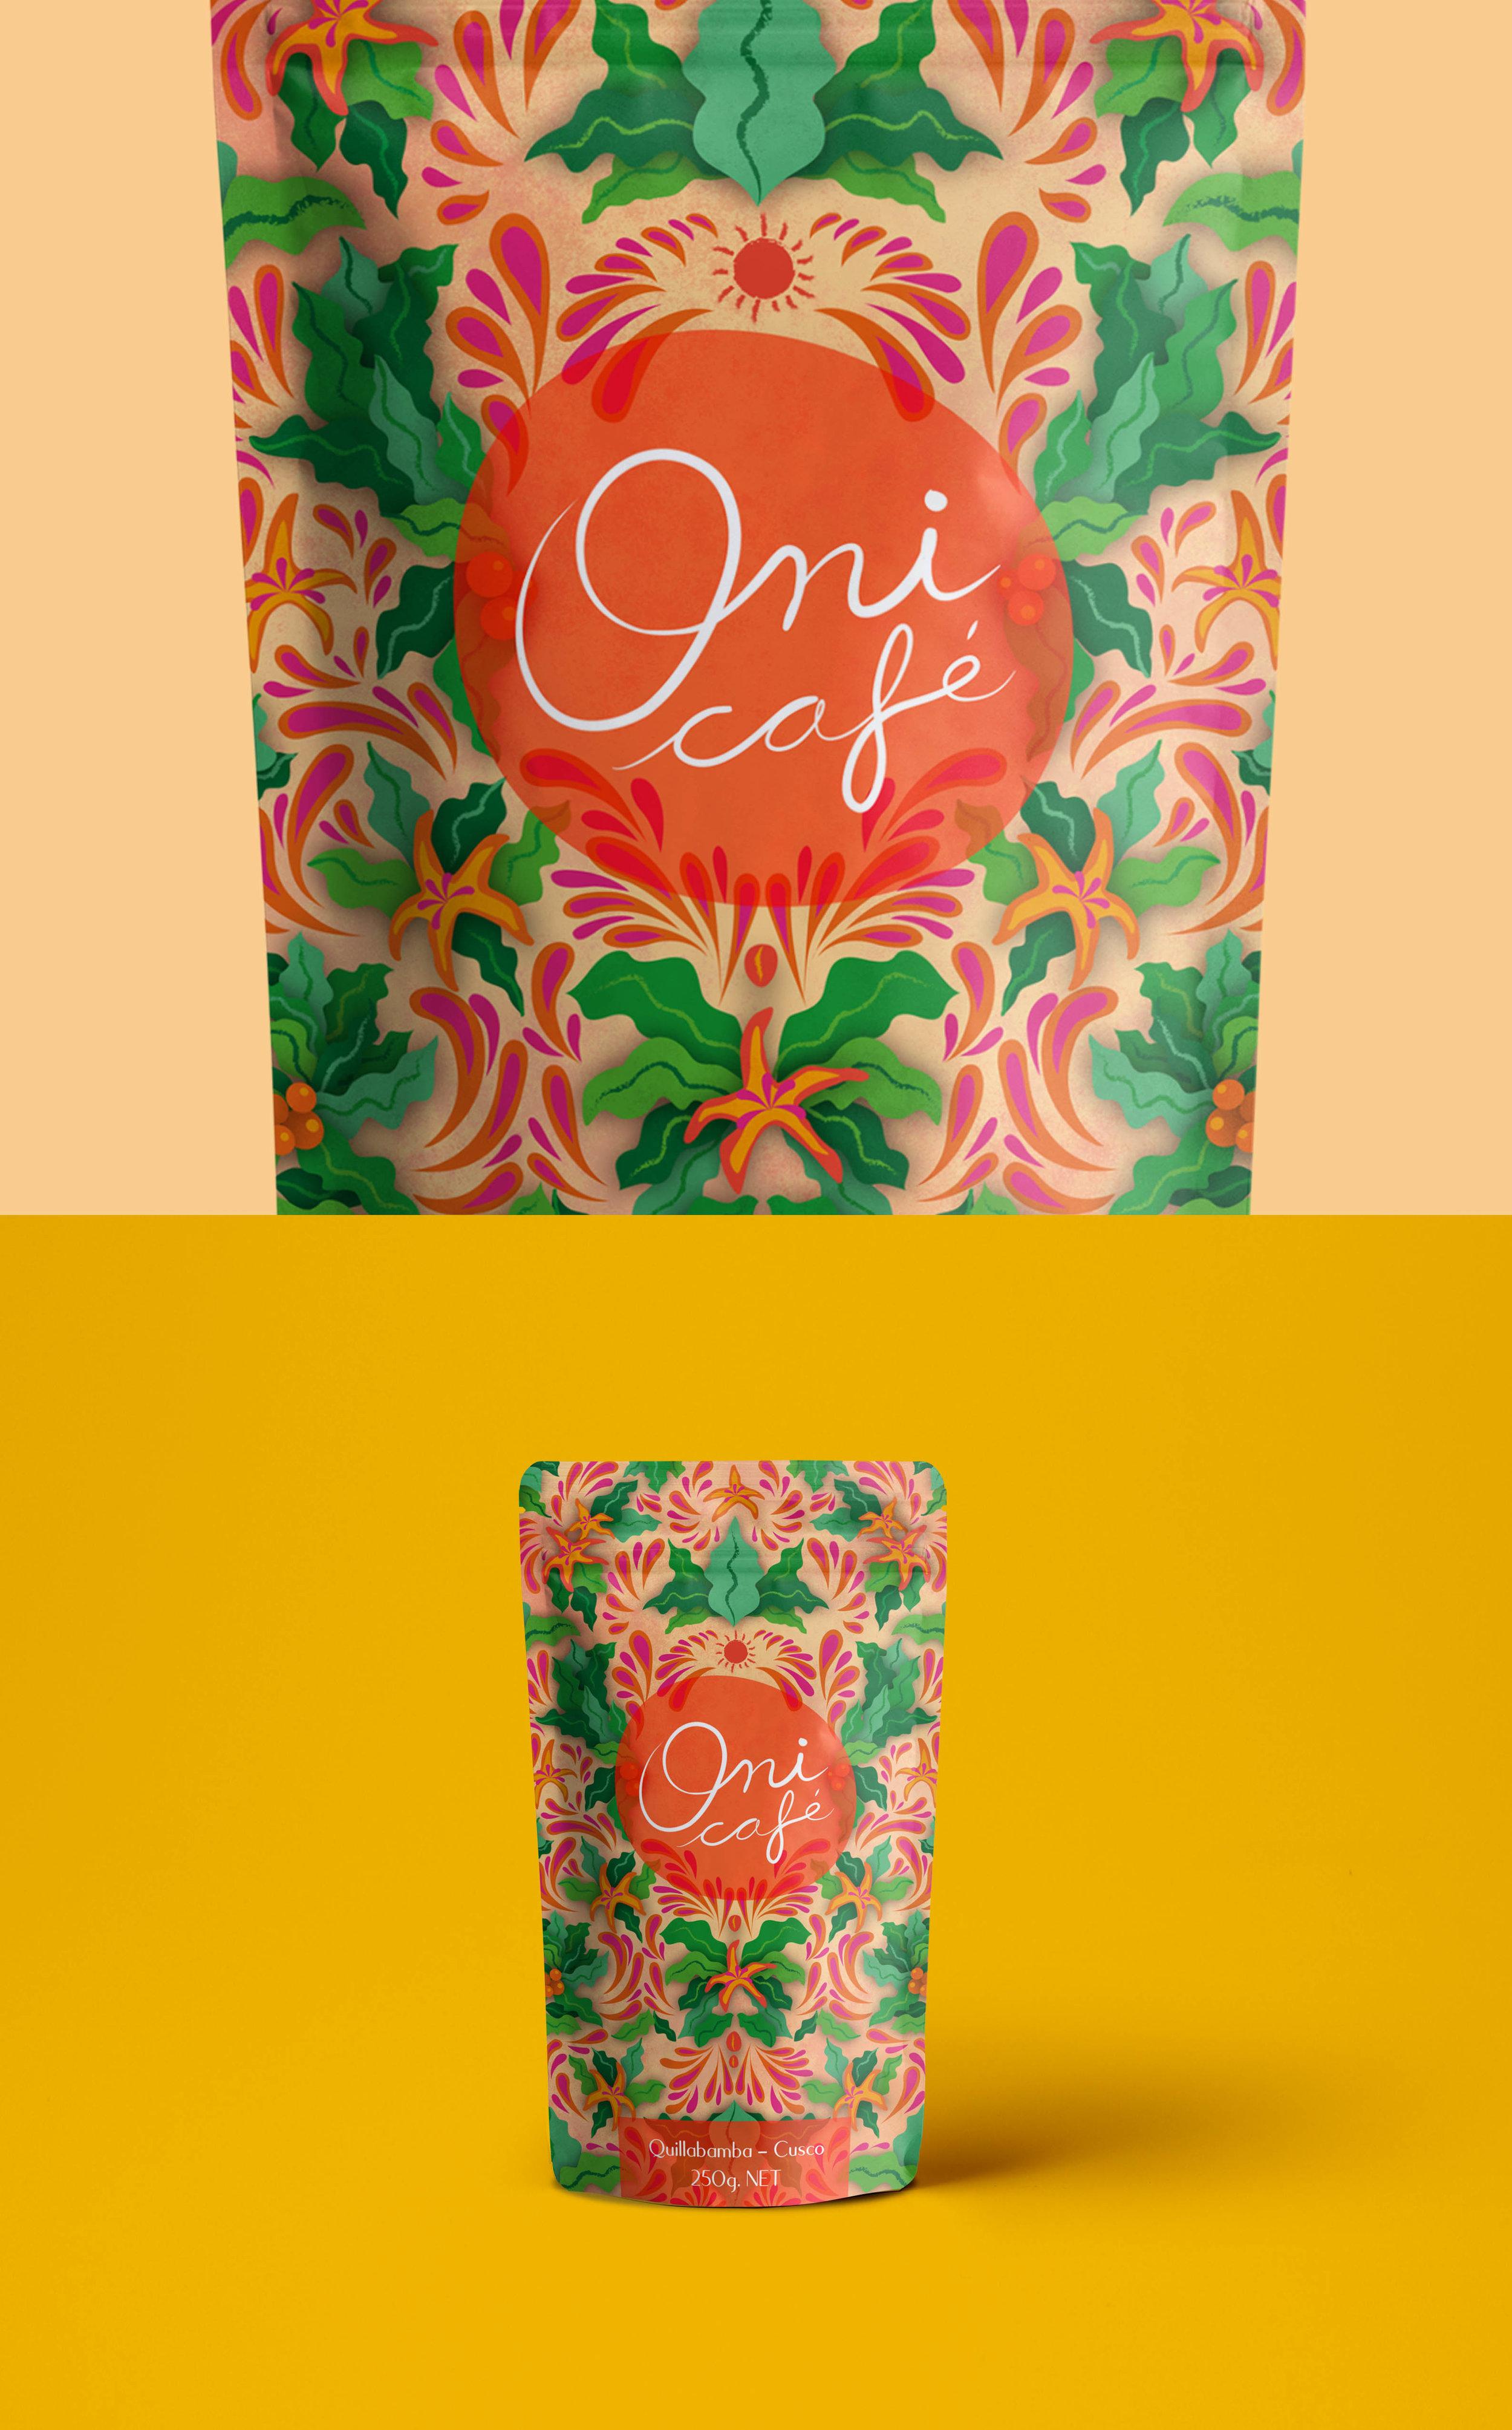 Coffee Brand Revalues Visual Elements of Cusco's Craftsmanship-Imagineria / World Brand Design Society